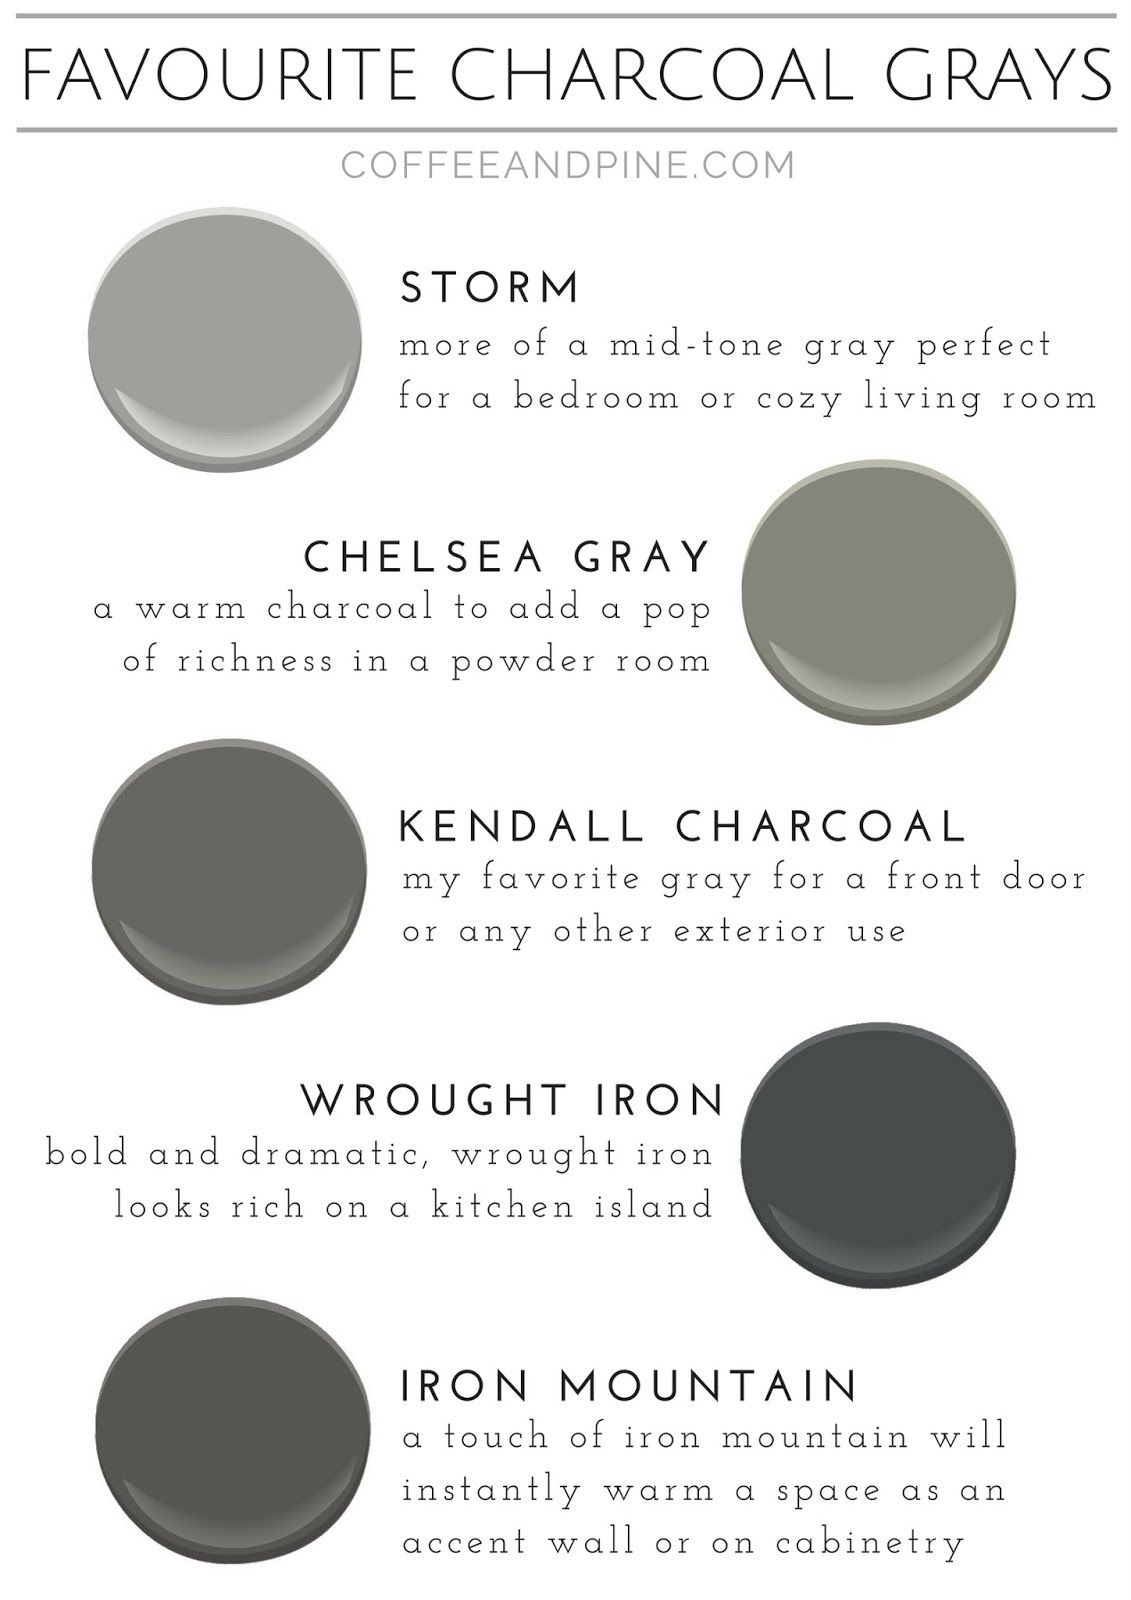 Favorite Charcoal Grays Paint Colors For Home Kendall Charcoal Farmhouse Paint Colors